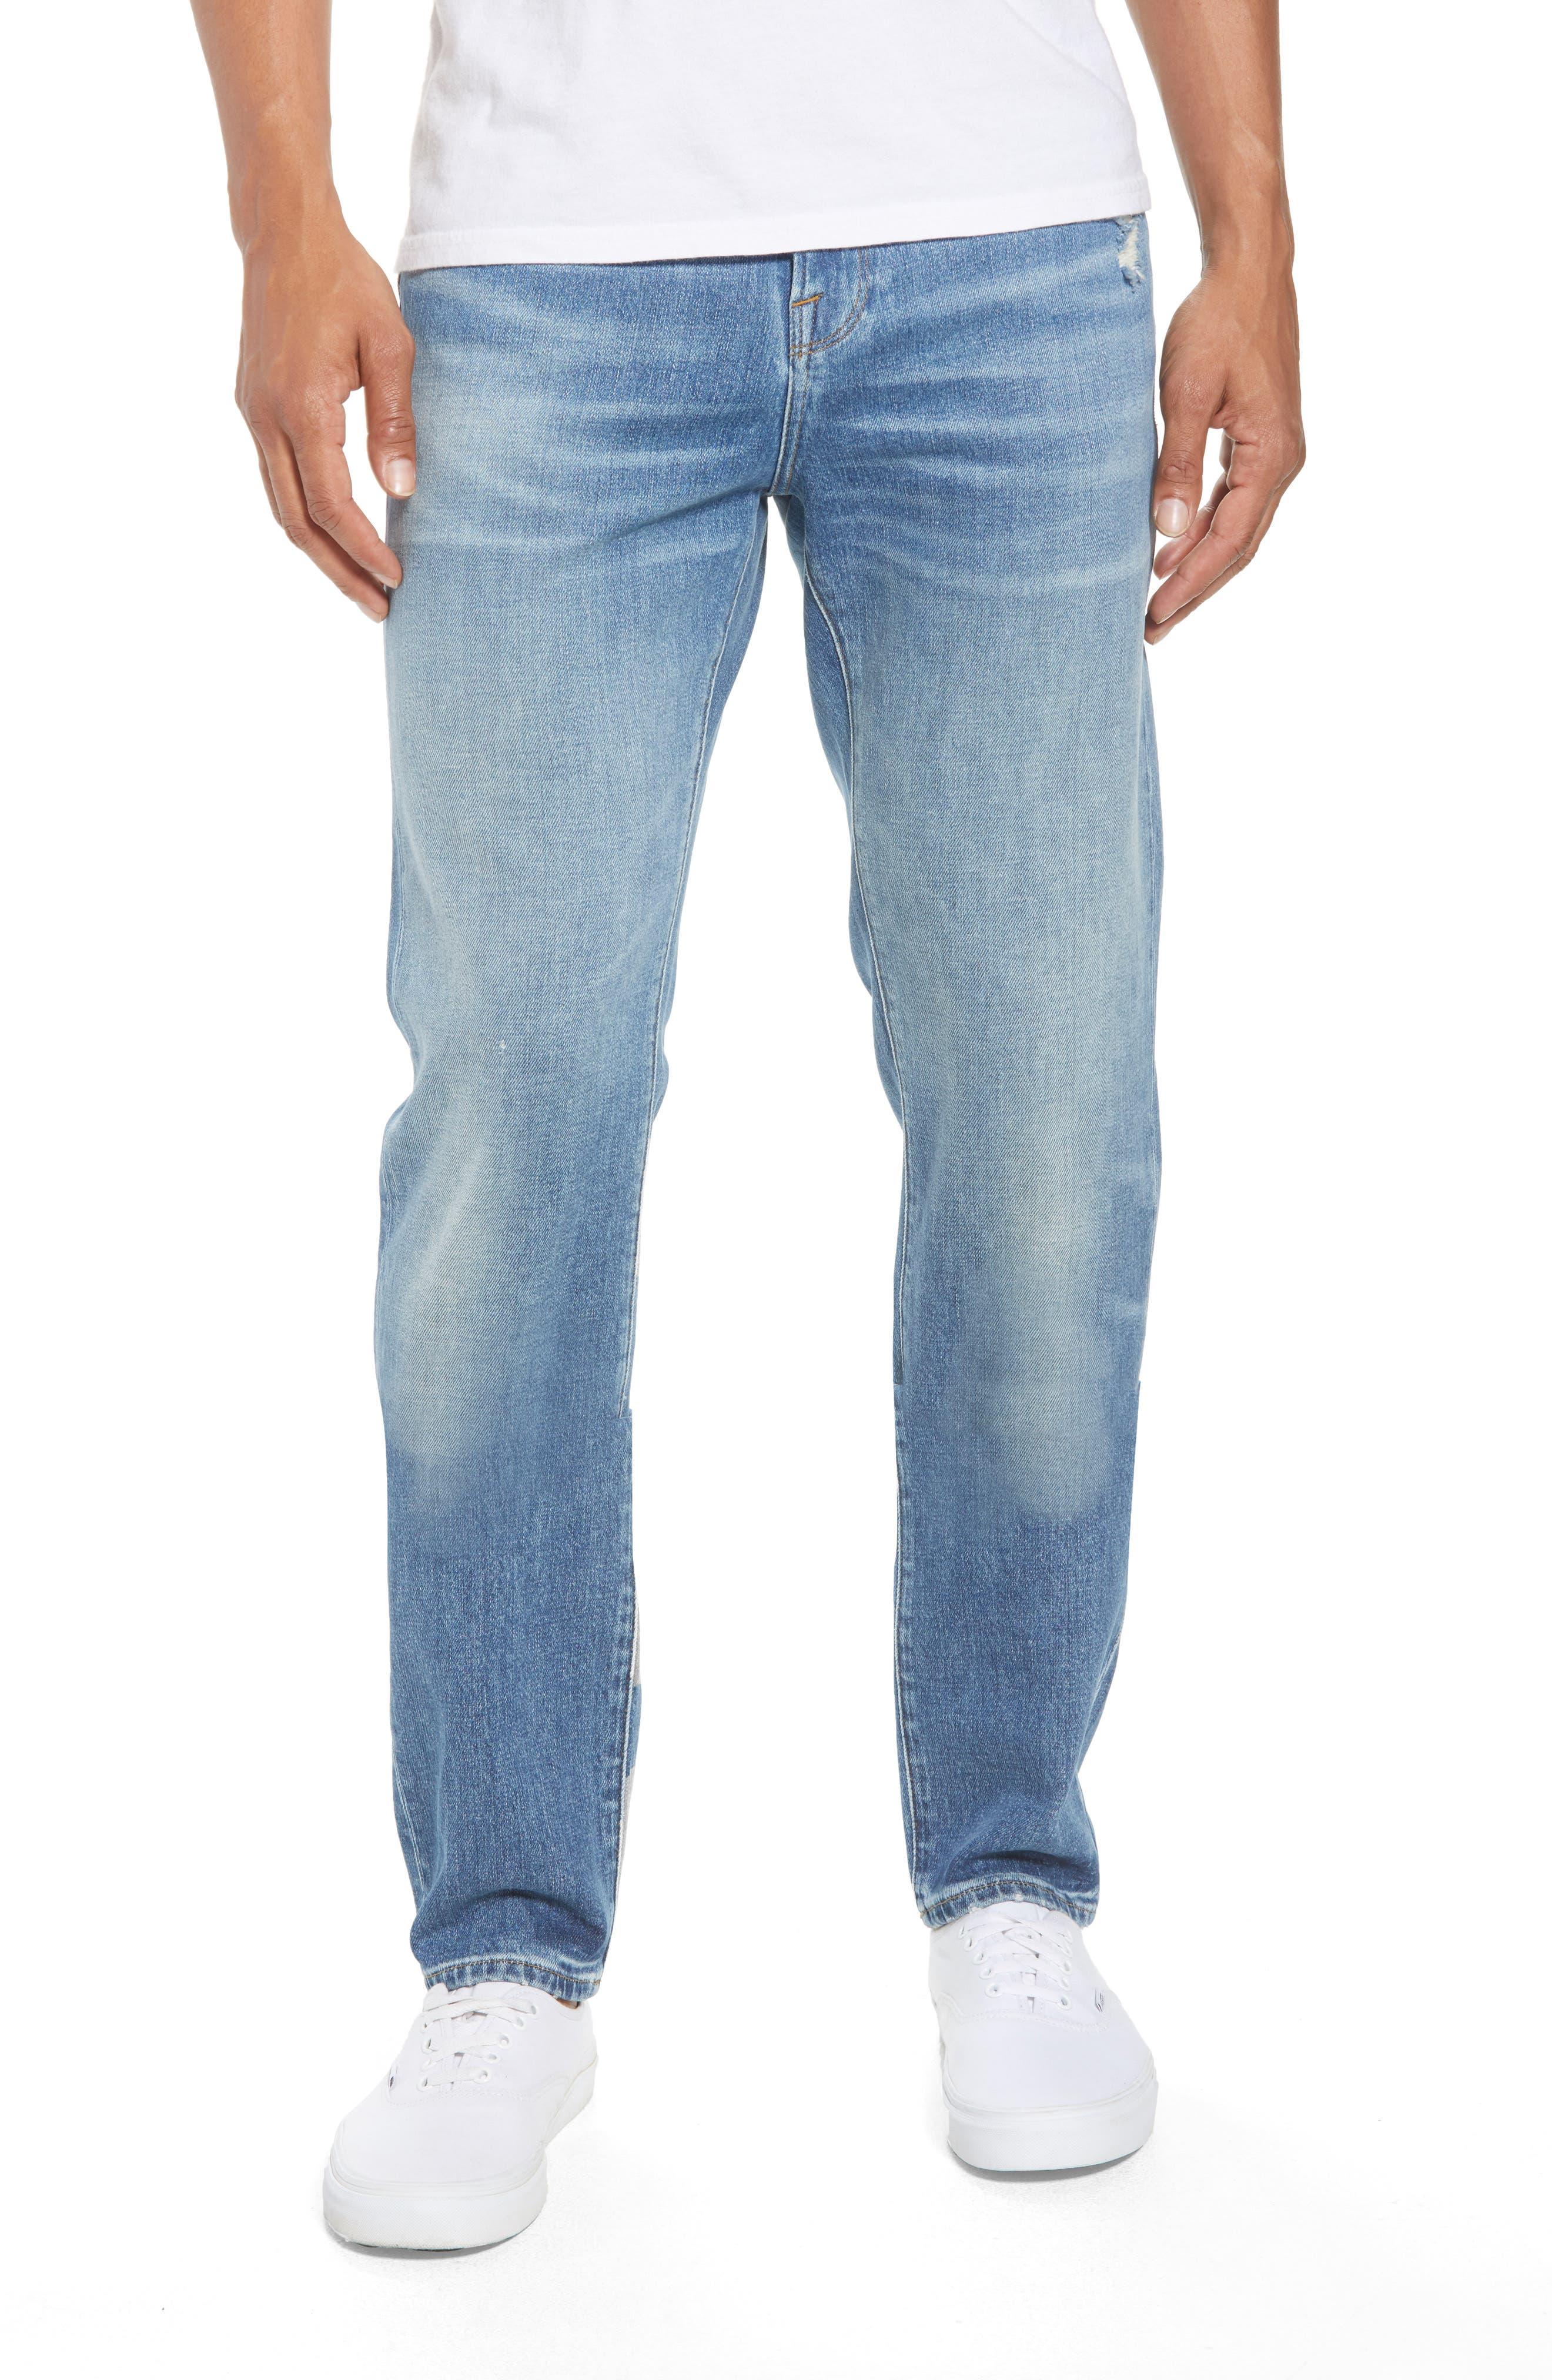 L'Homme Skinny Jeans,                         Main,                         color, PICKNEY